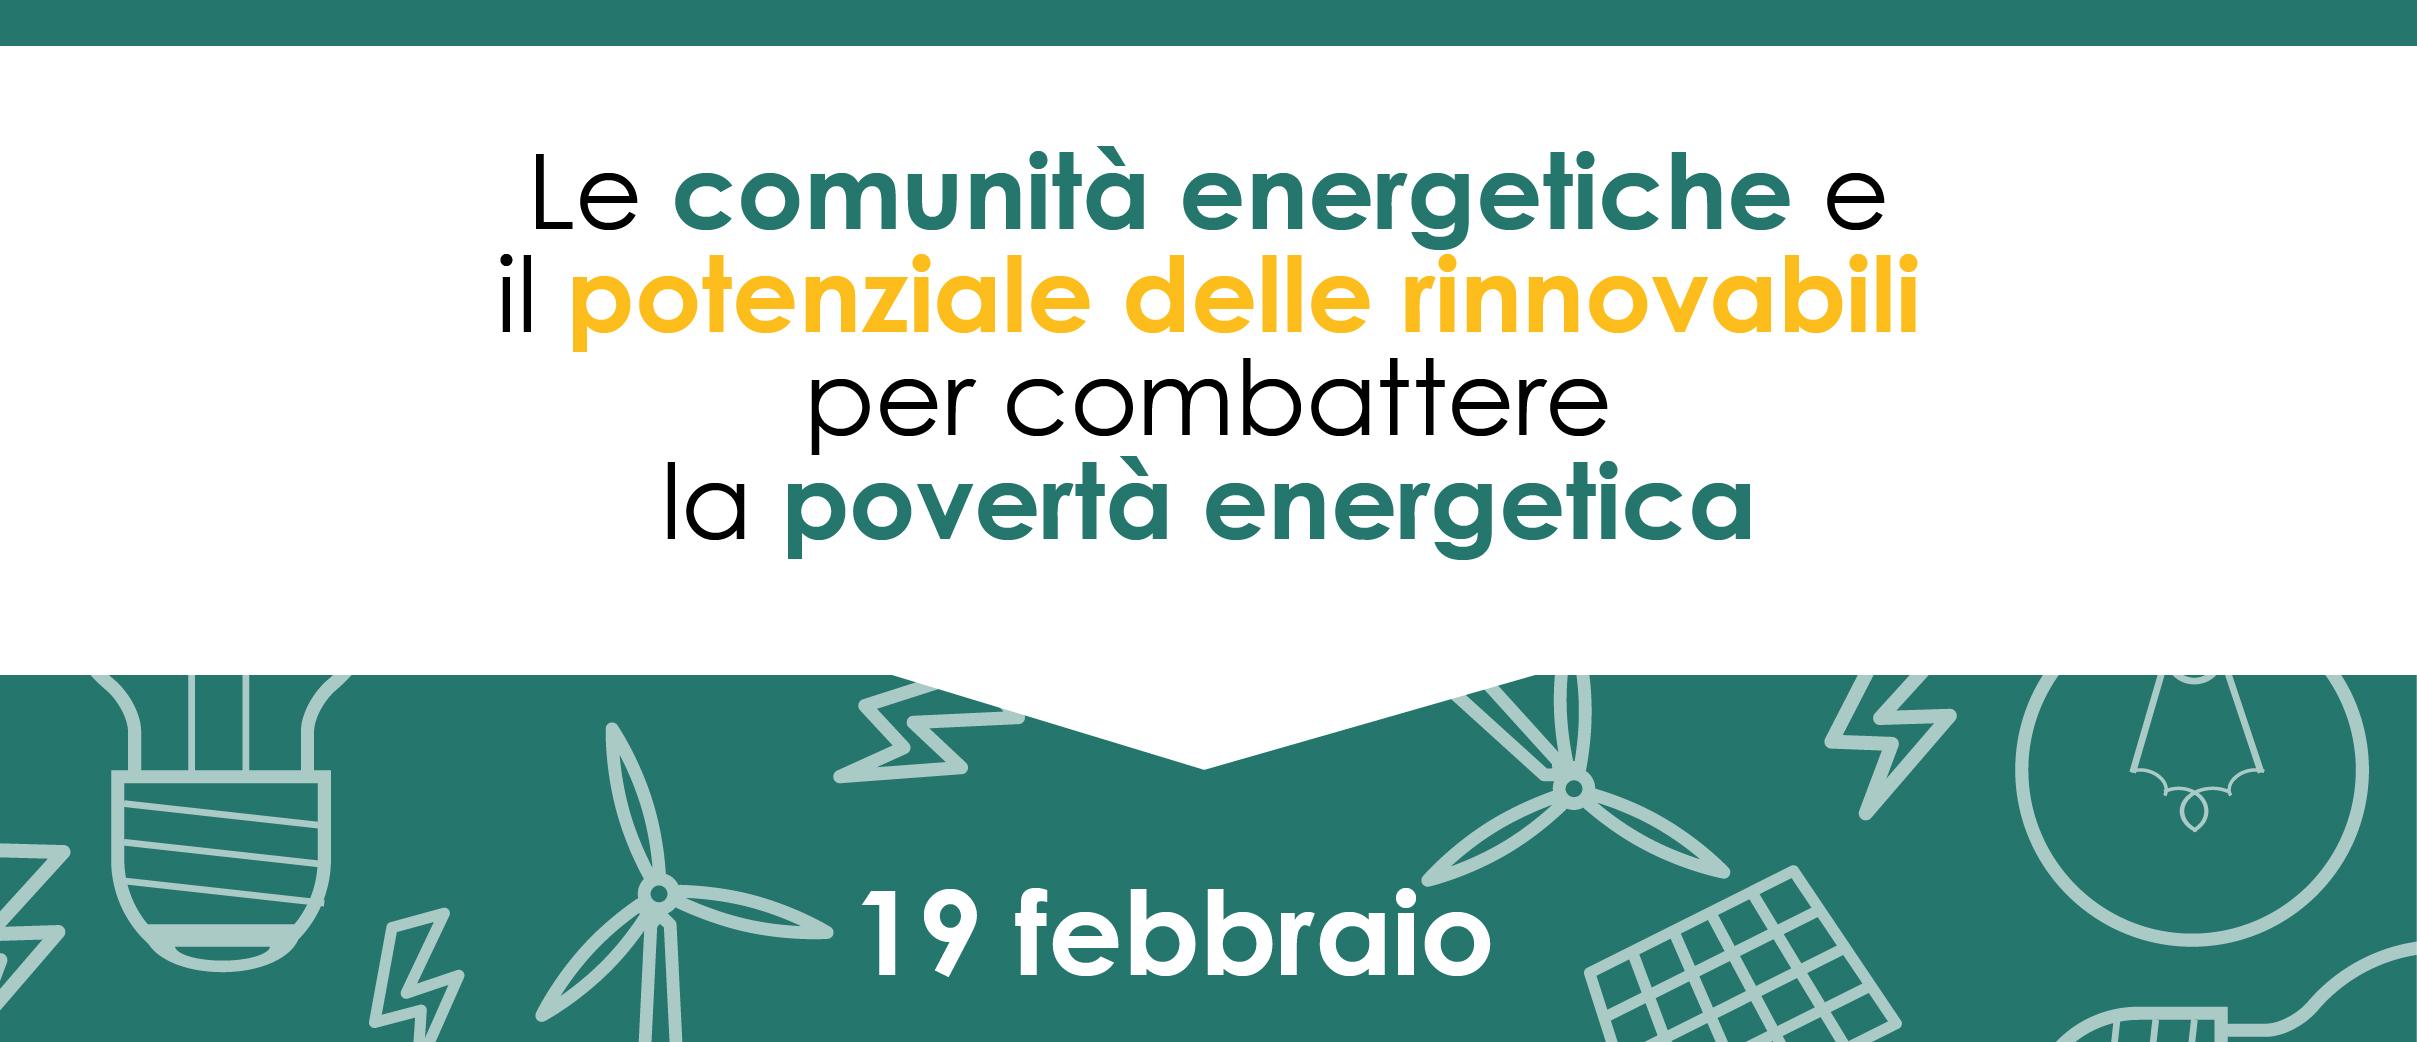 evento_povert_19febbraio-testata-09